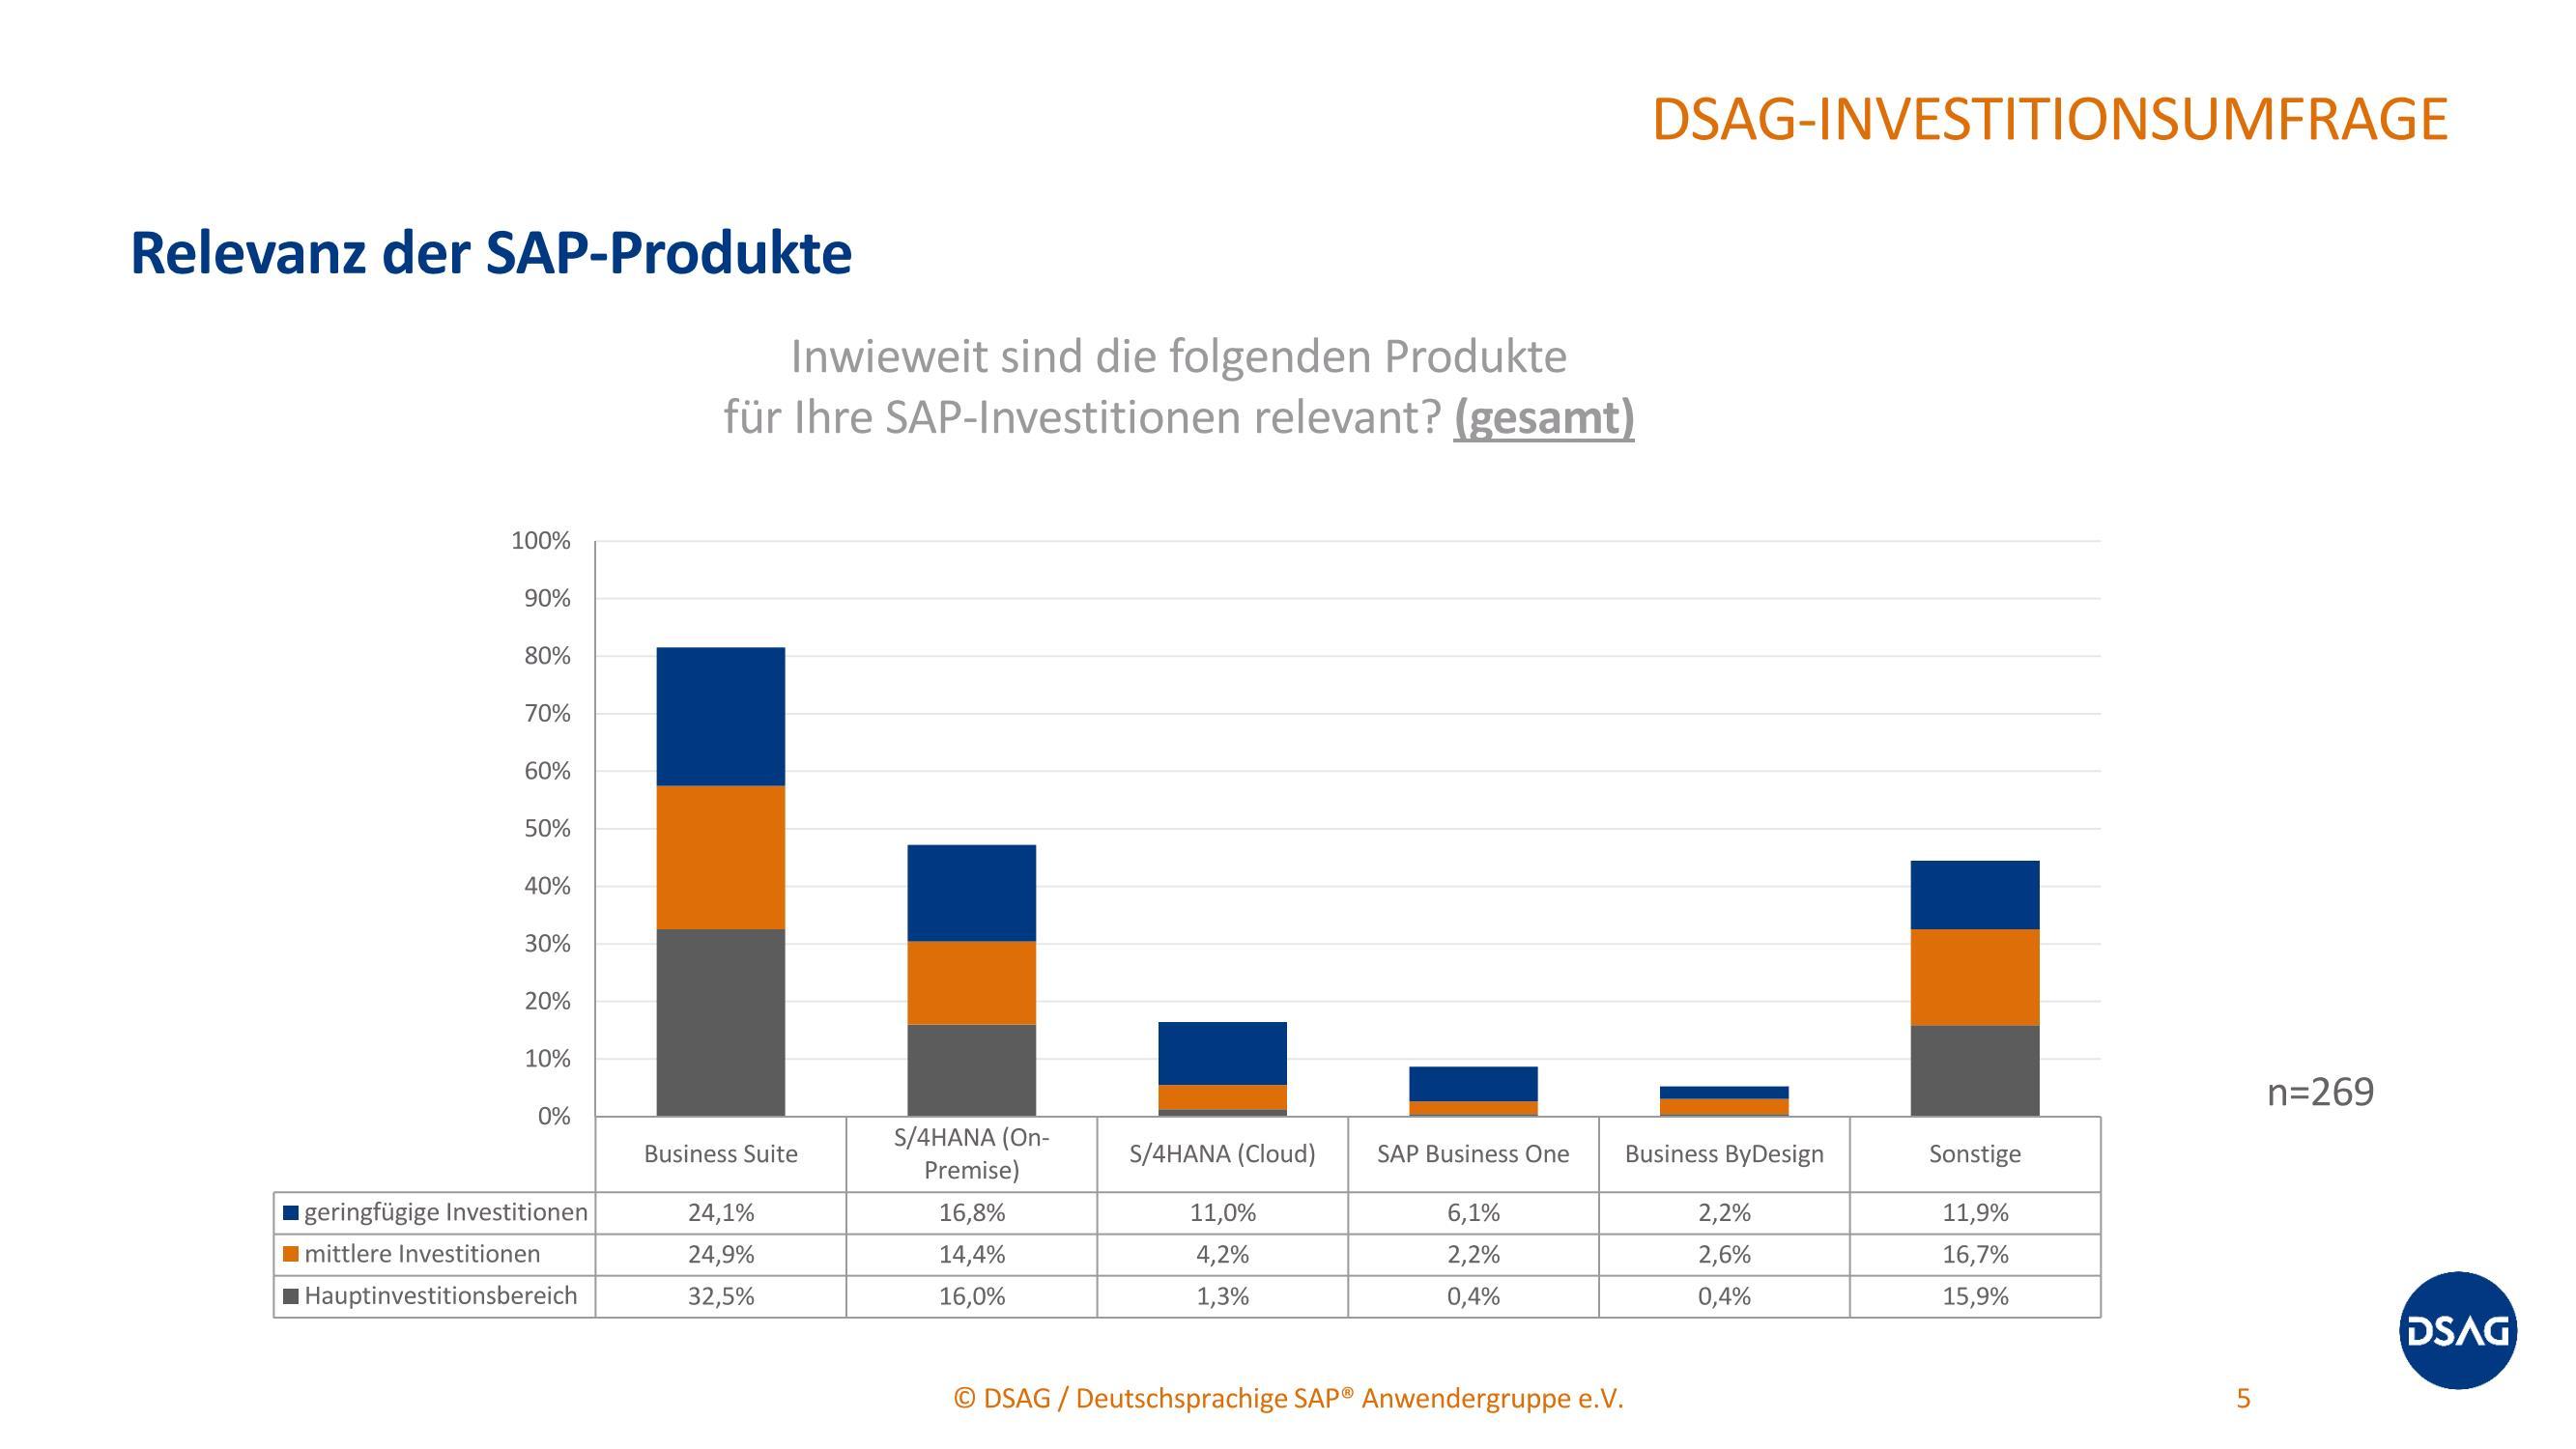 grafik dsag relevanz sap-produkte